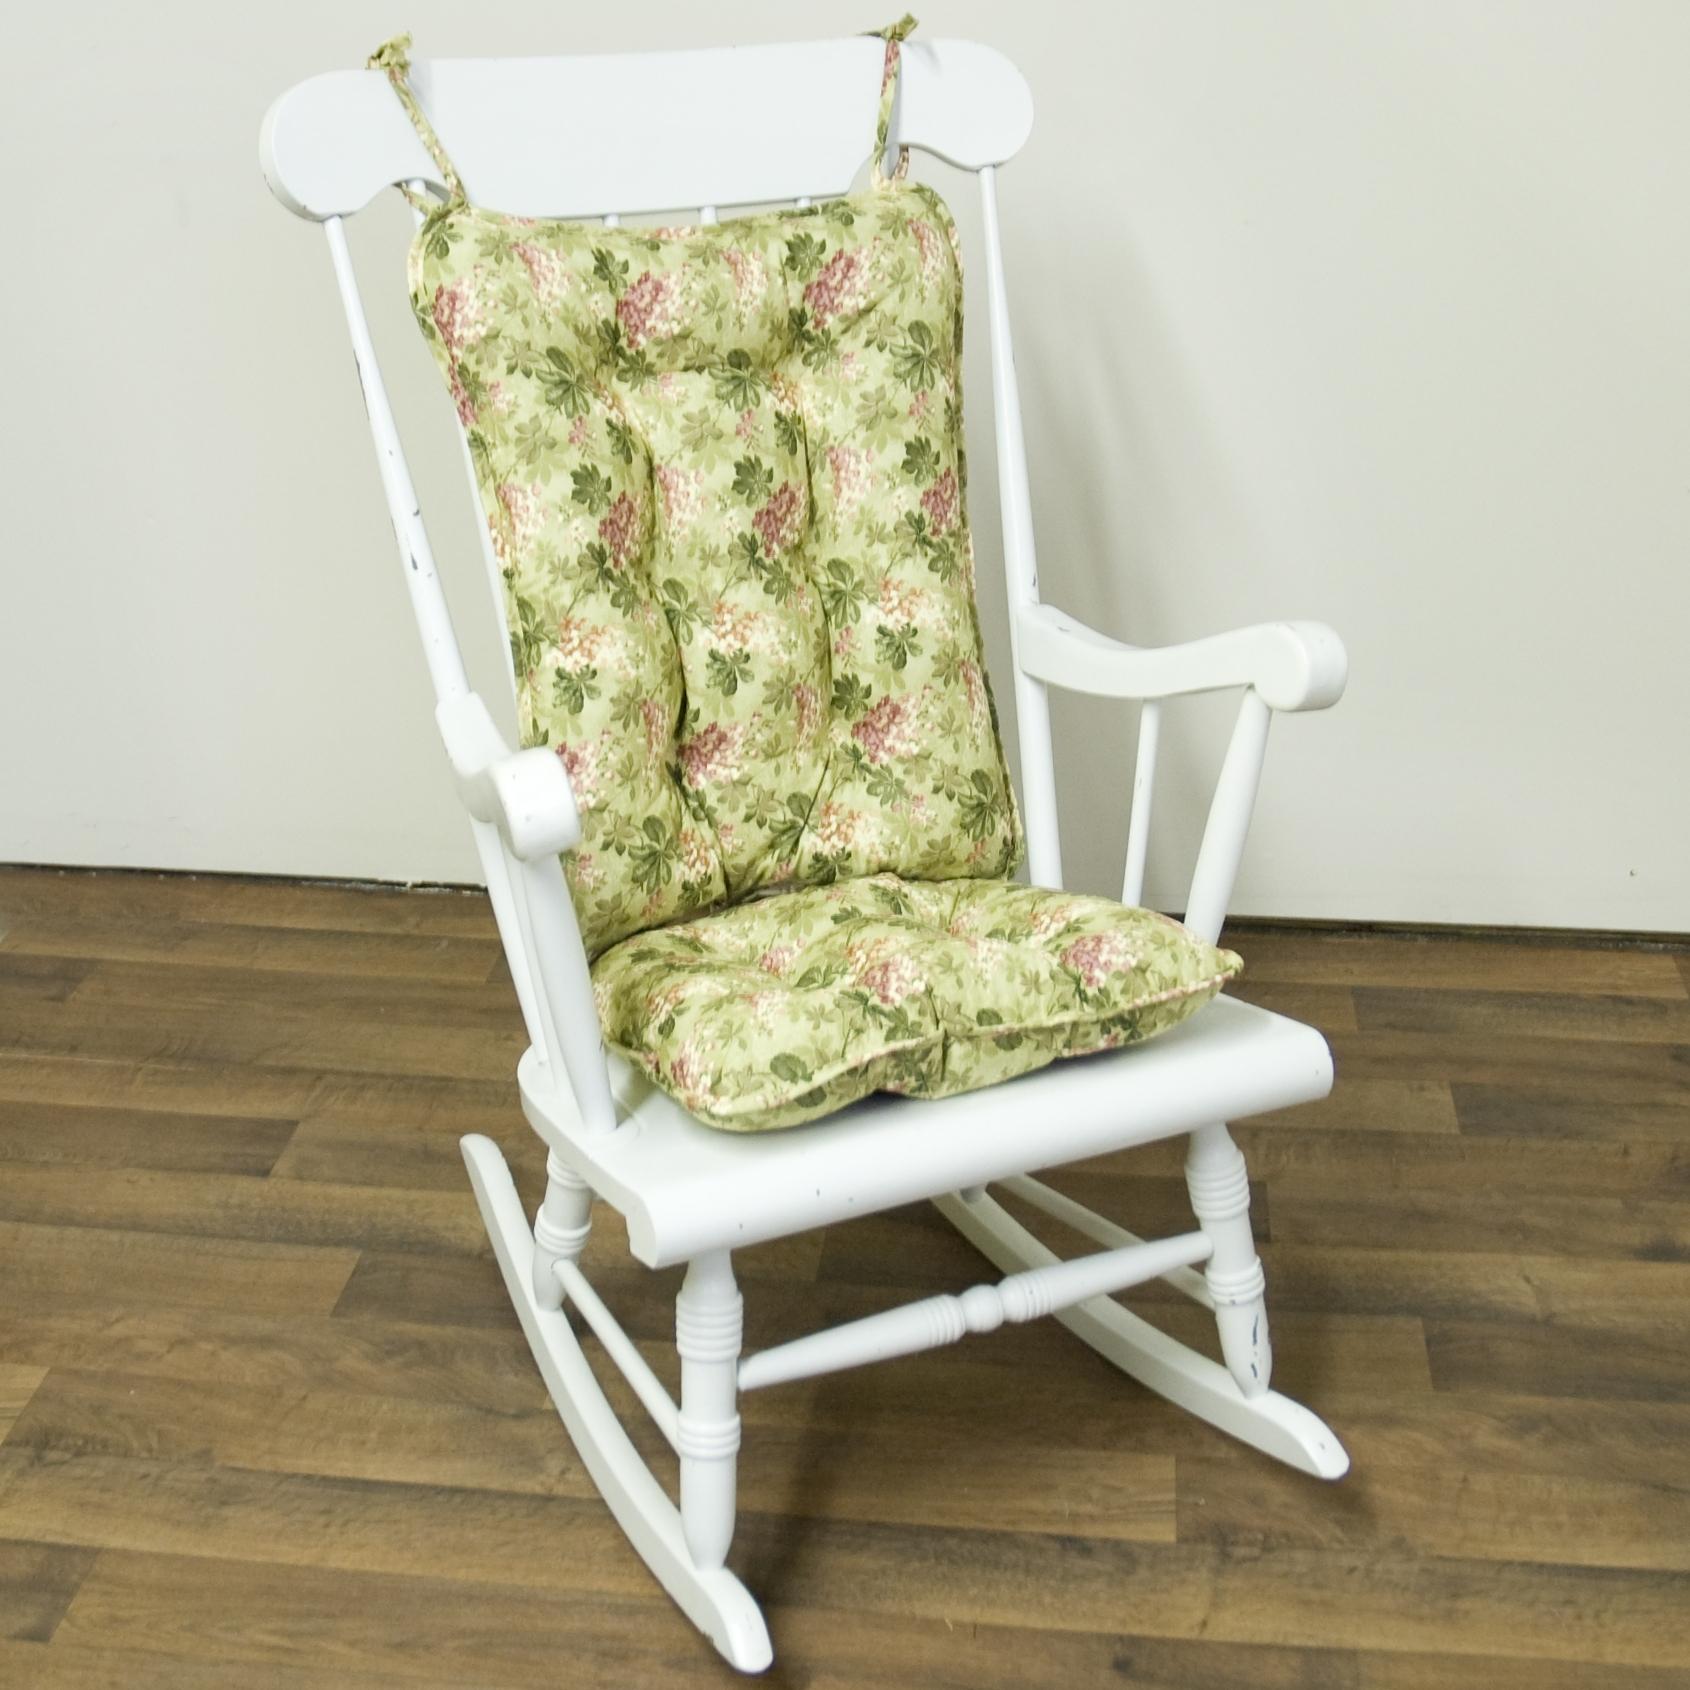 Rocking Chair Cushions For Outdoor Regarding Best And Newest Outdoor Rocking Chair Cushions Flower : Beautiful Outdoor Rocking (View 15 of 15)